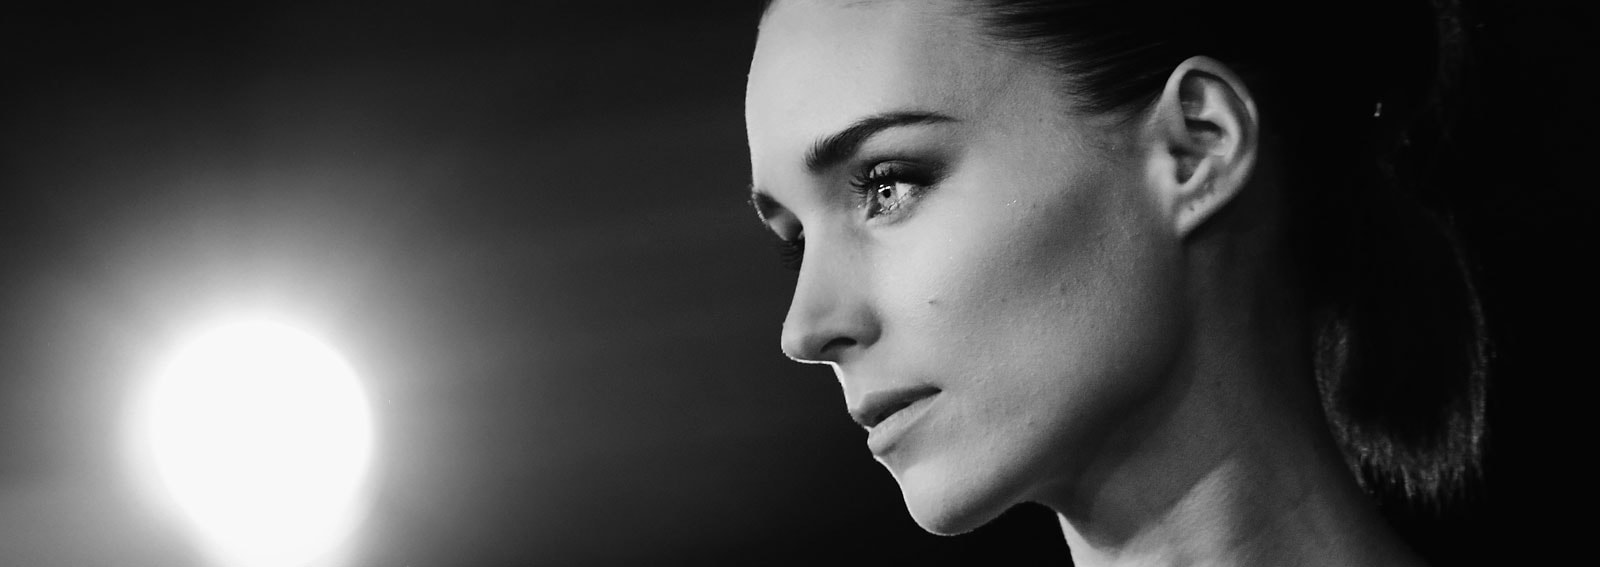 Rooney-Mara-cover-desktop